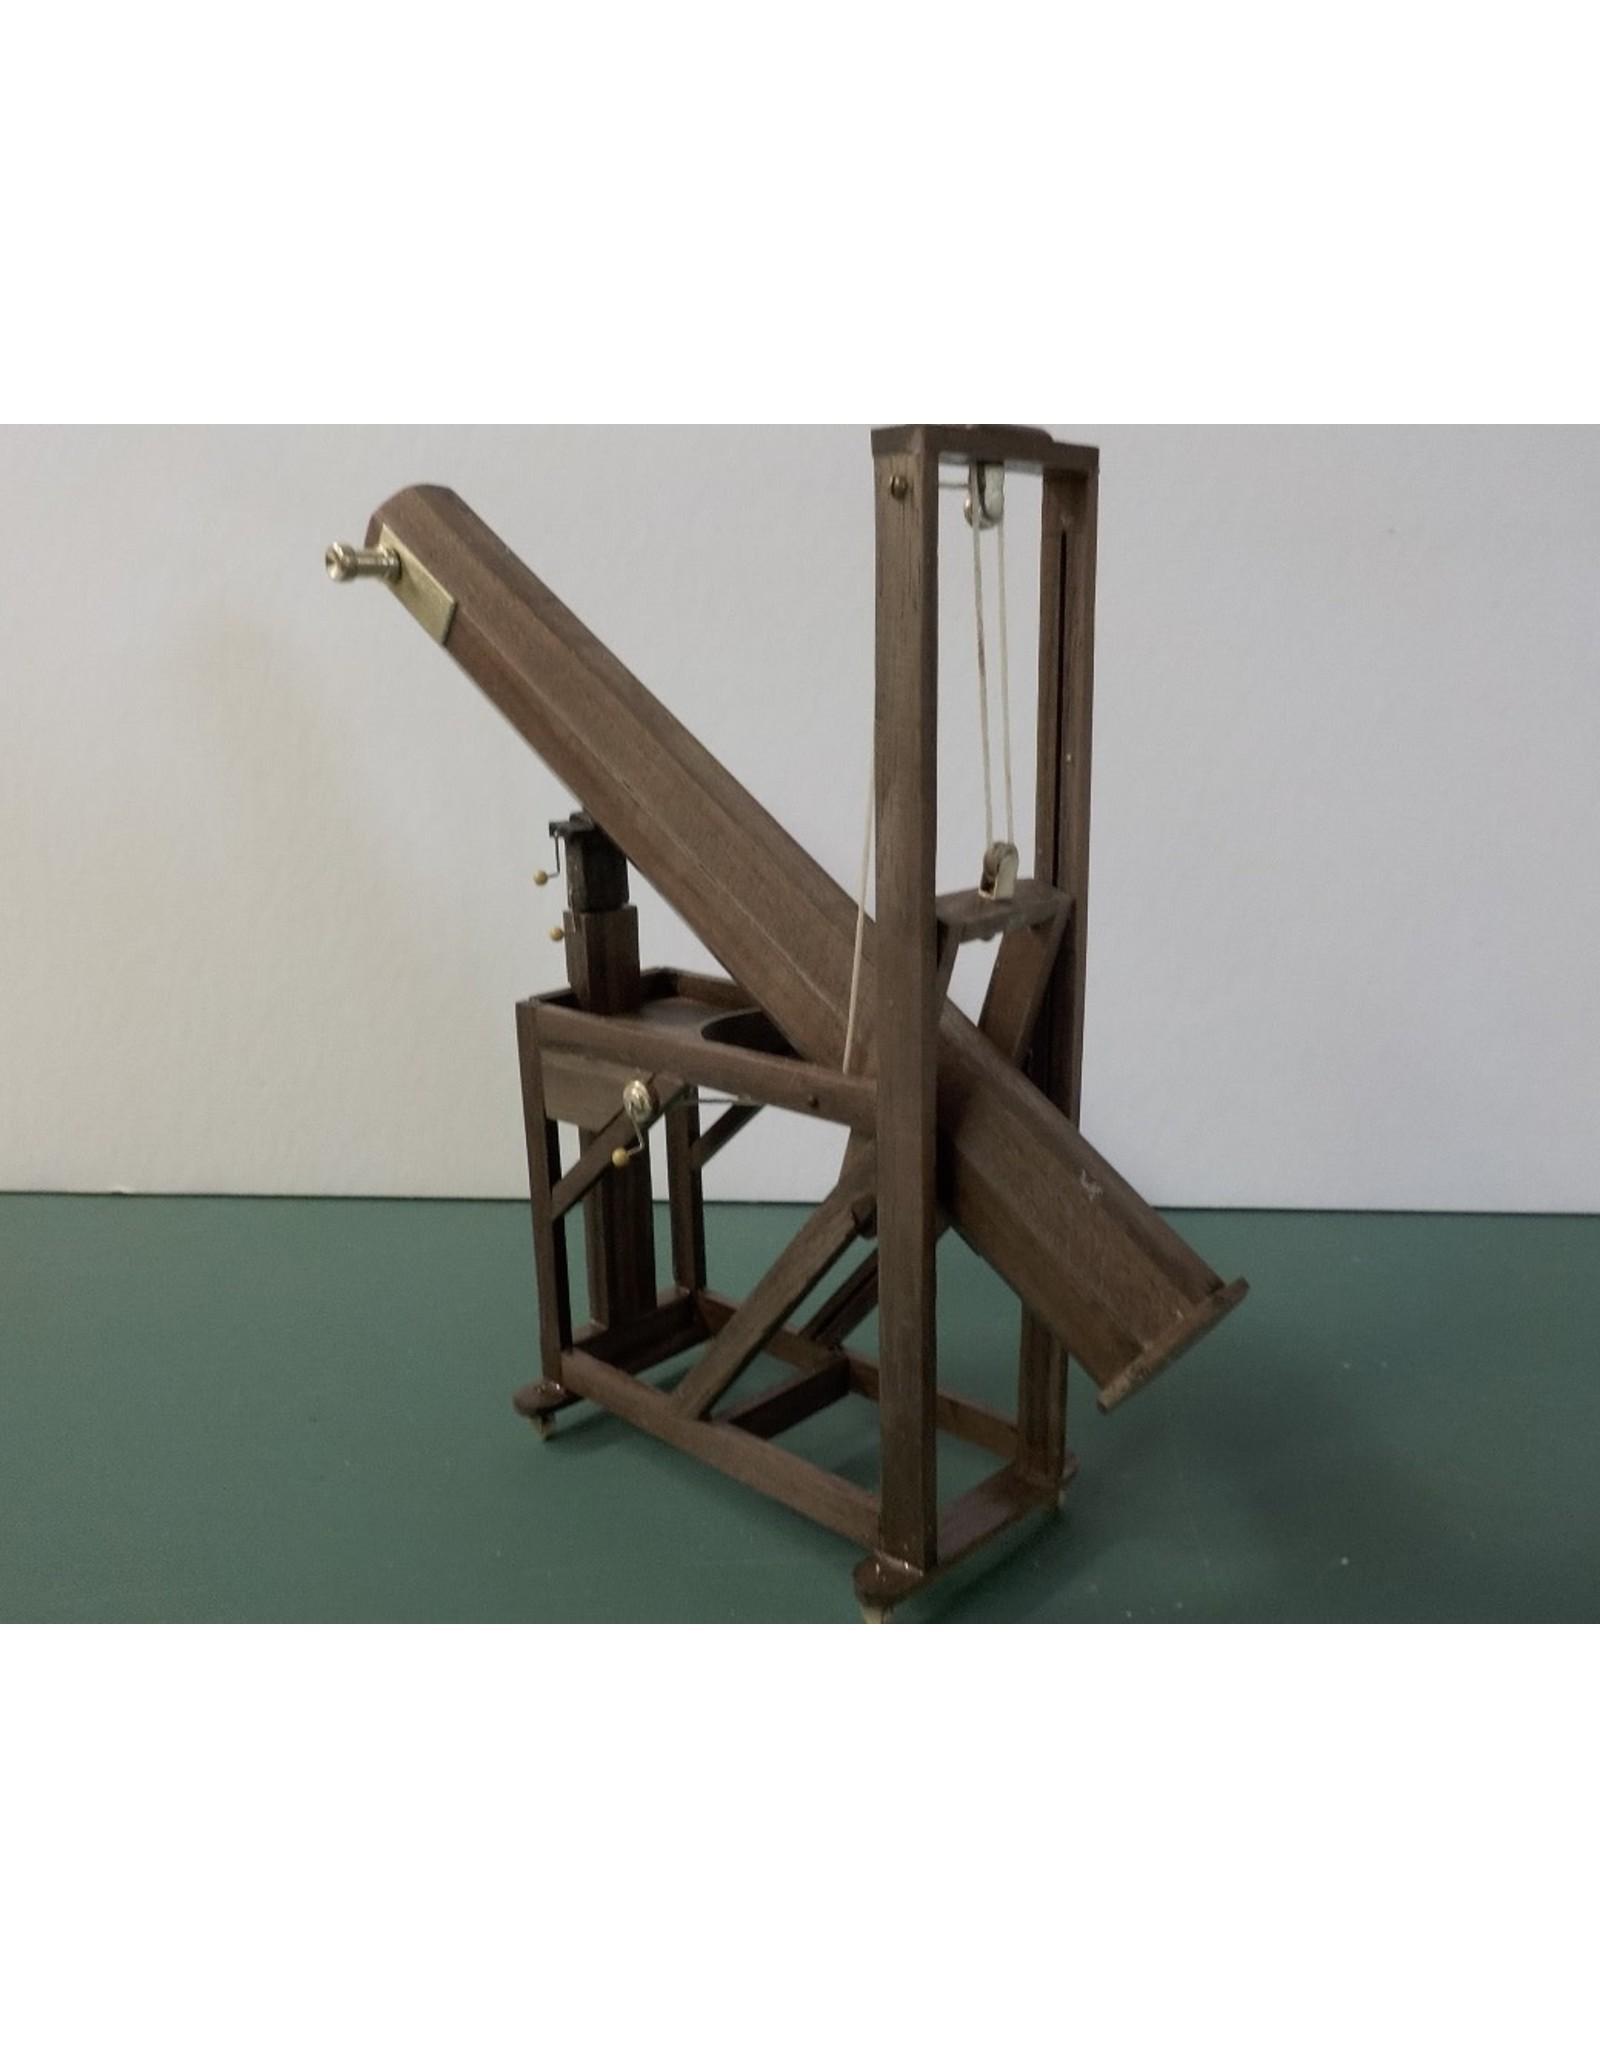 B. Crist Miniature Herschel 7 Foot Reflector (PREORDER NOW!)